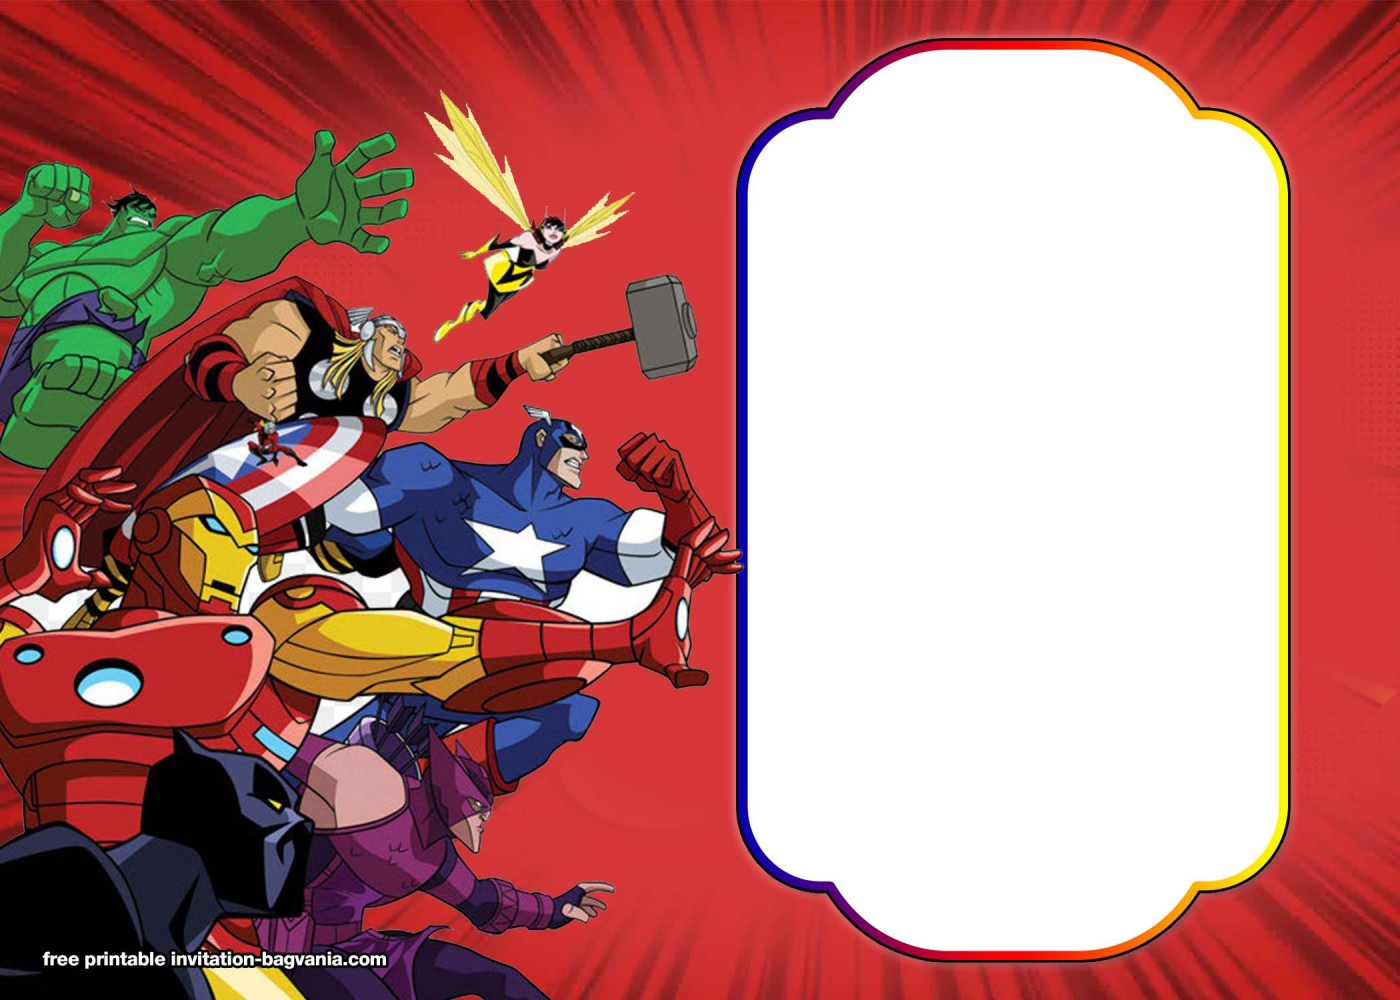 004 Unique Superhero Birthday Invitation Template Free High Resolution 1400